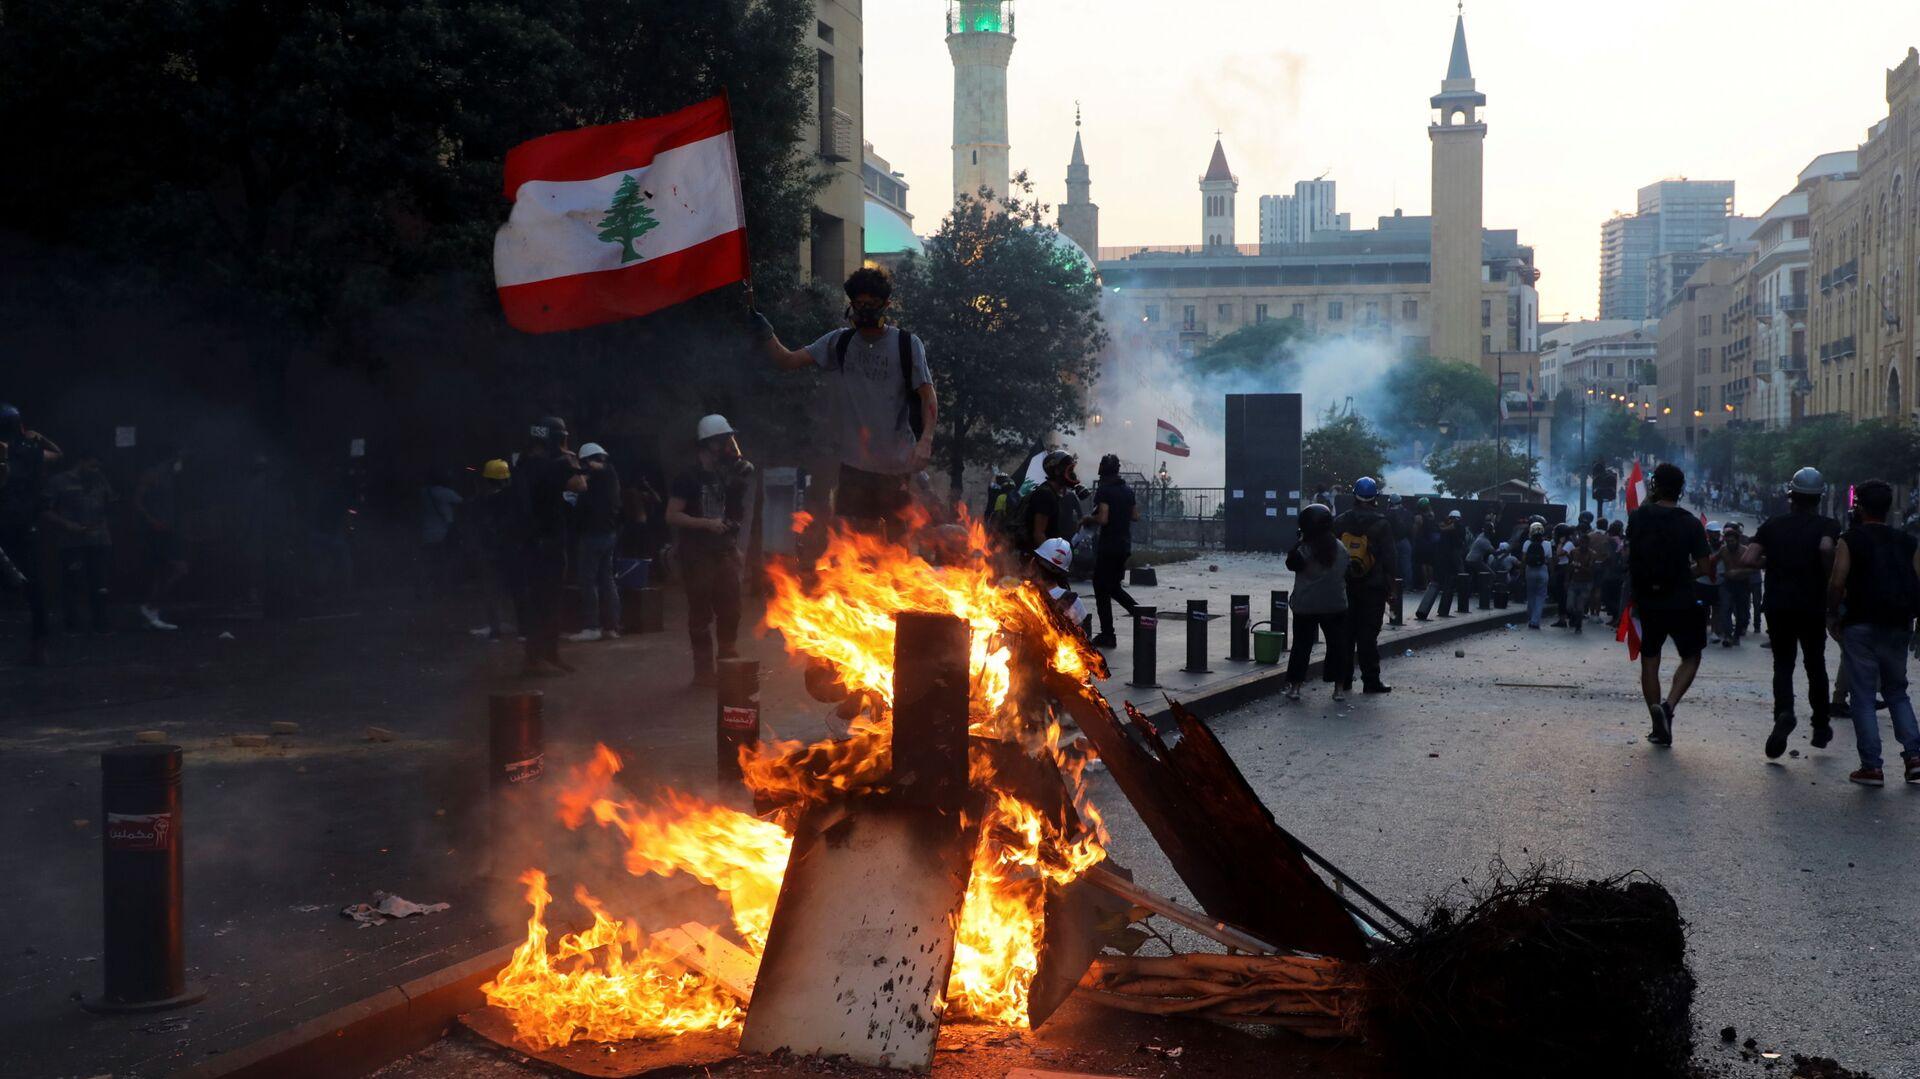 Protesty w Bejrucie - Sputnik Polska, 1920, 04.08.2021